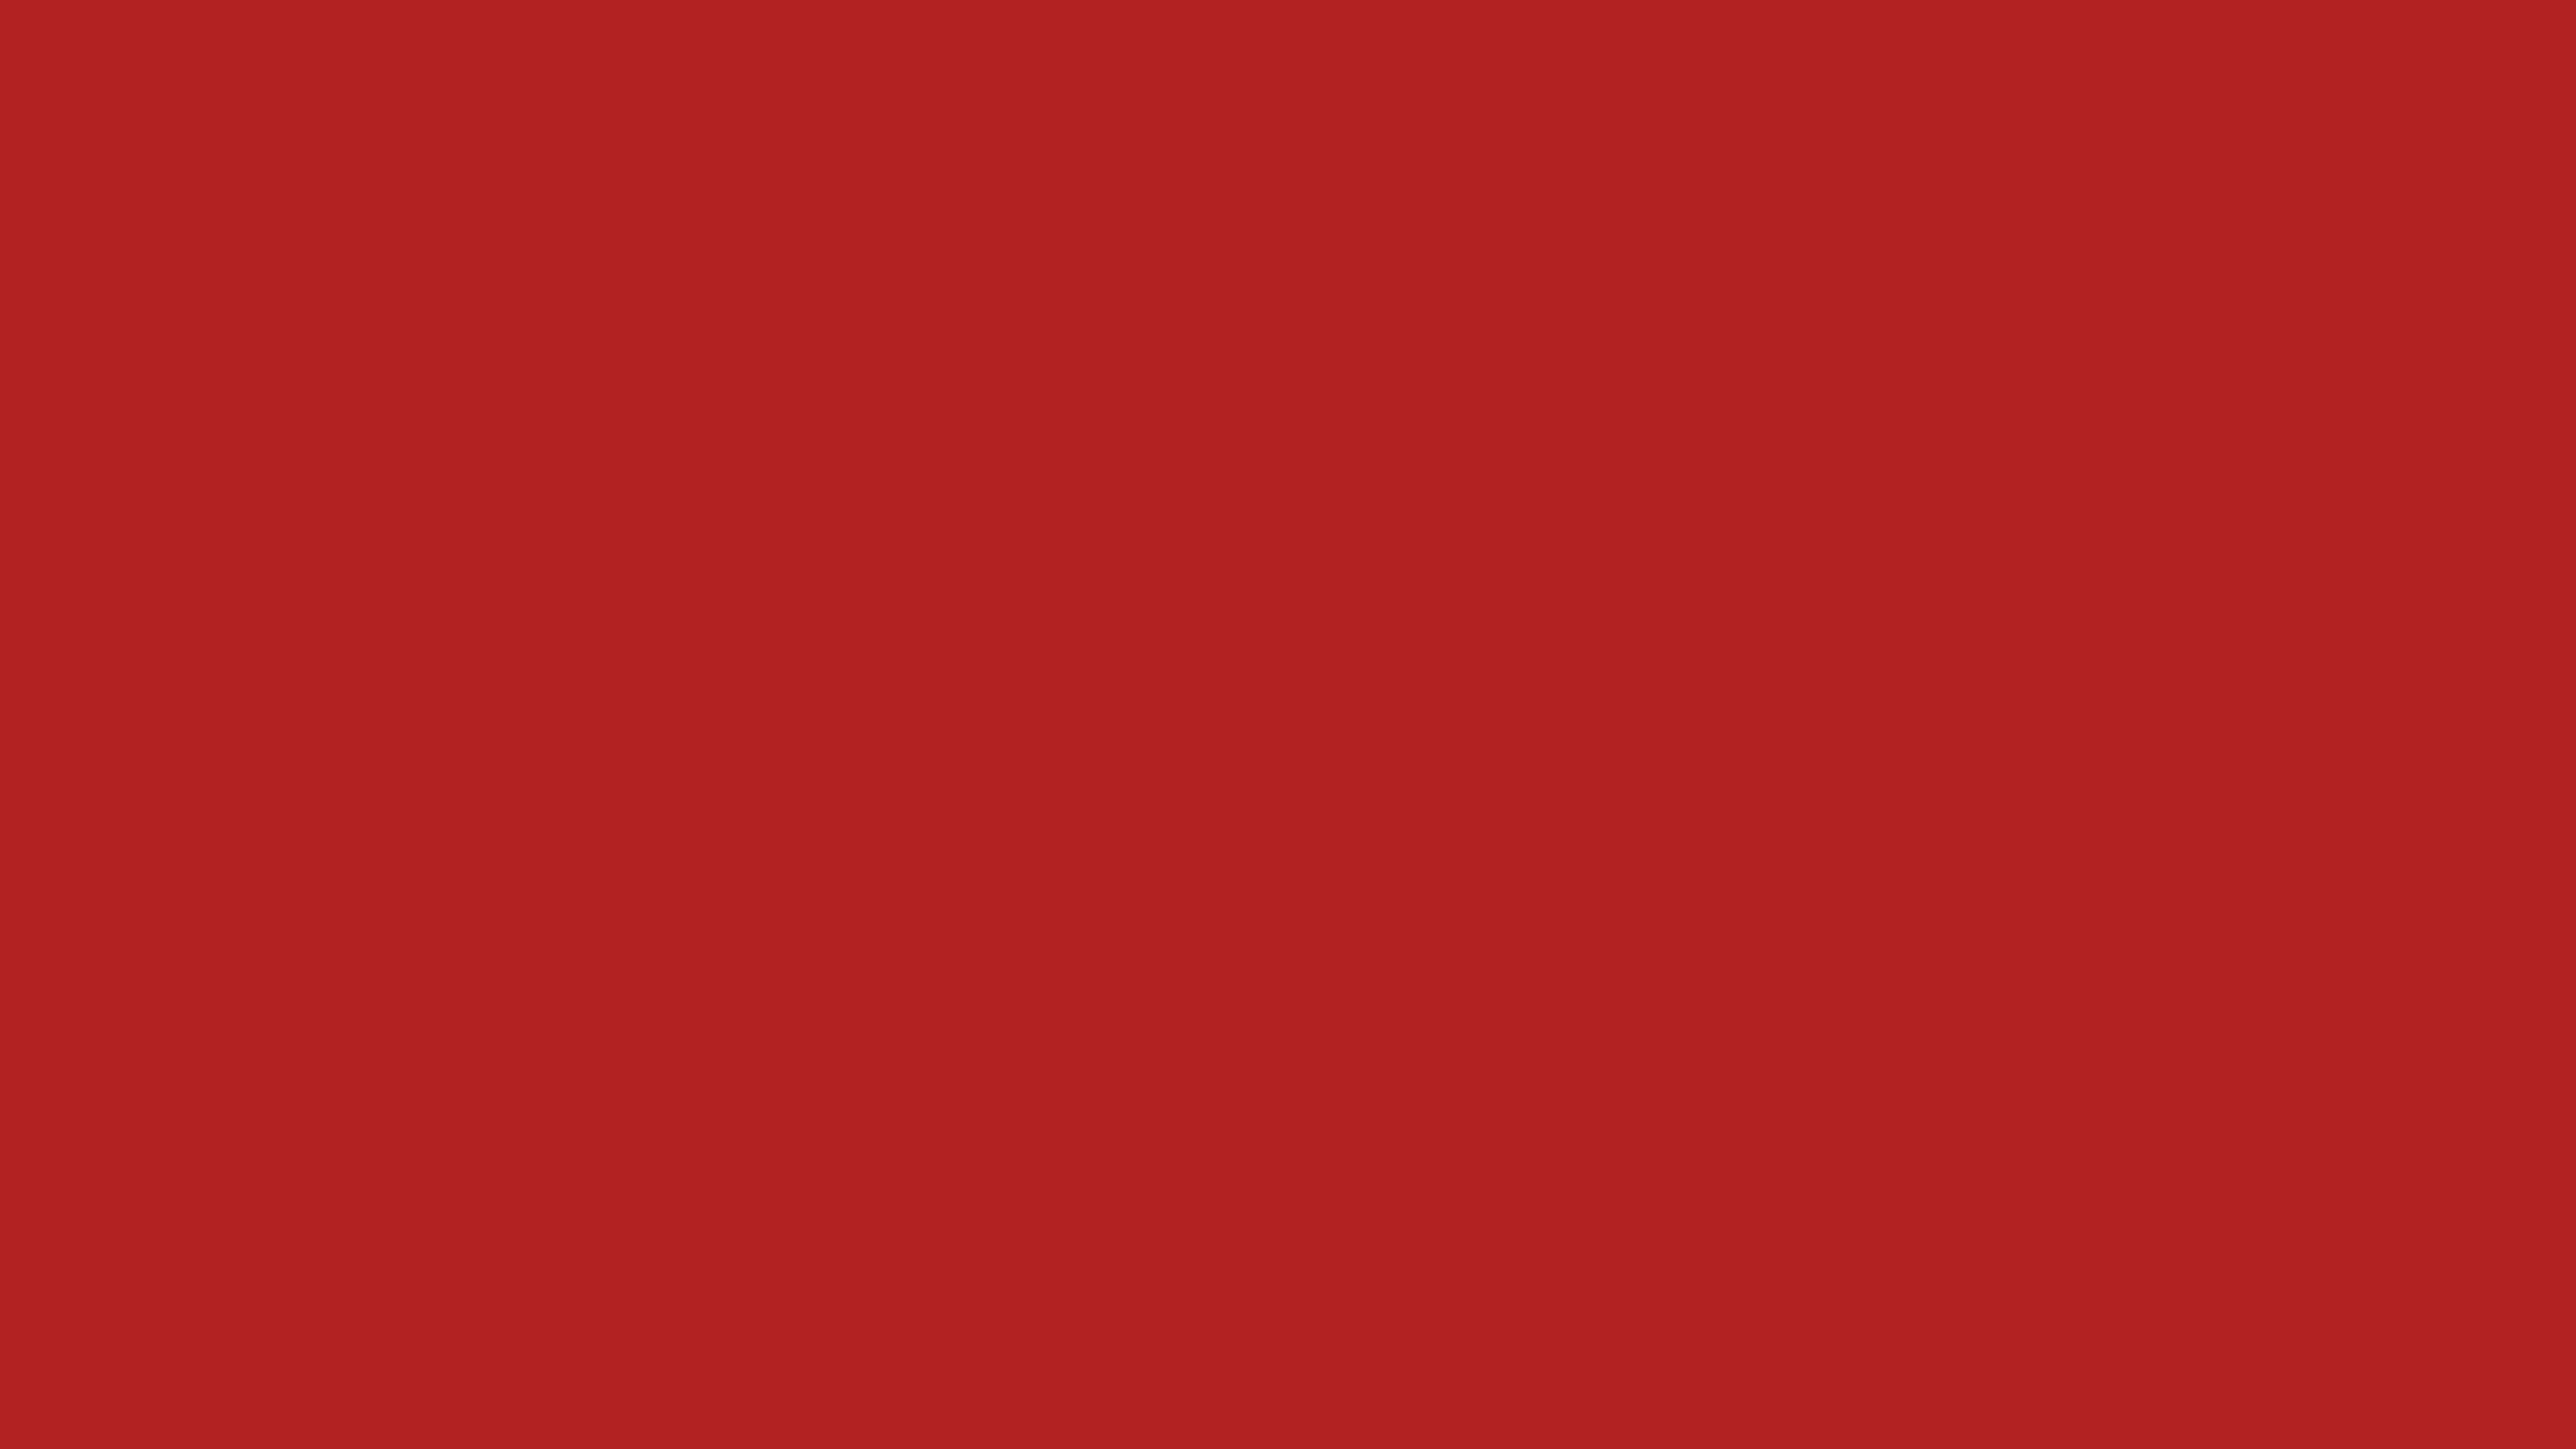 3840x2160 Firebrick Solid Color Background